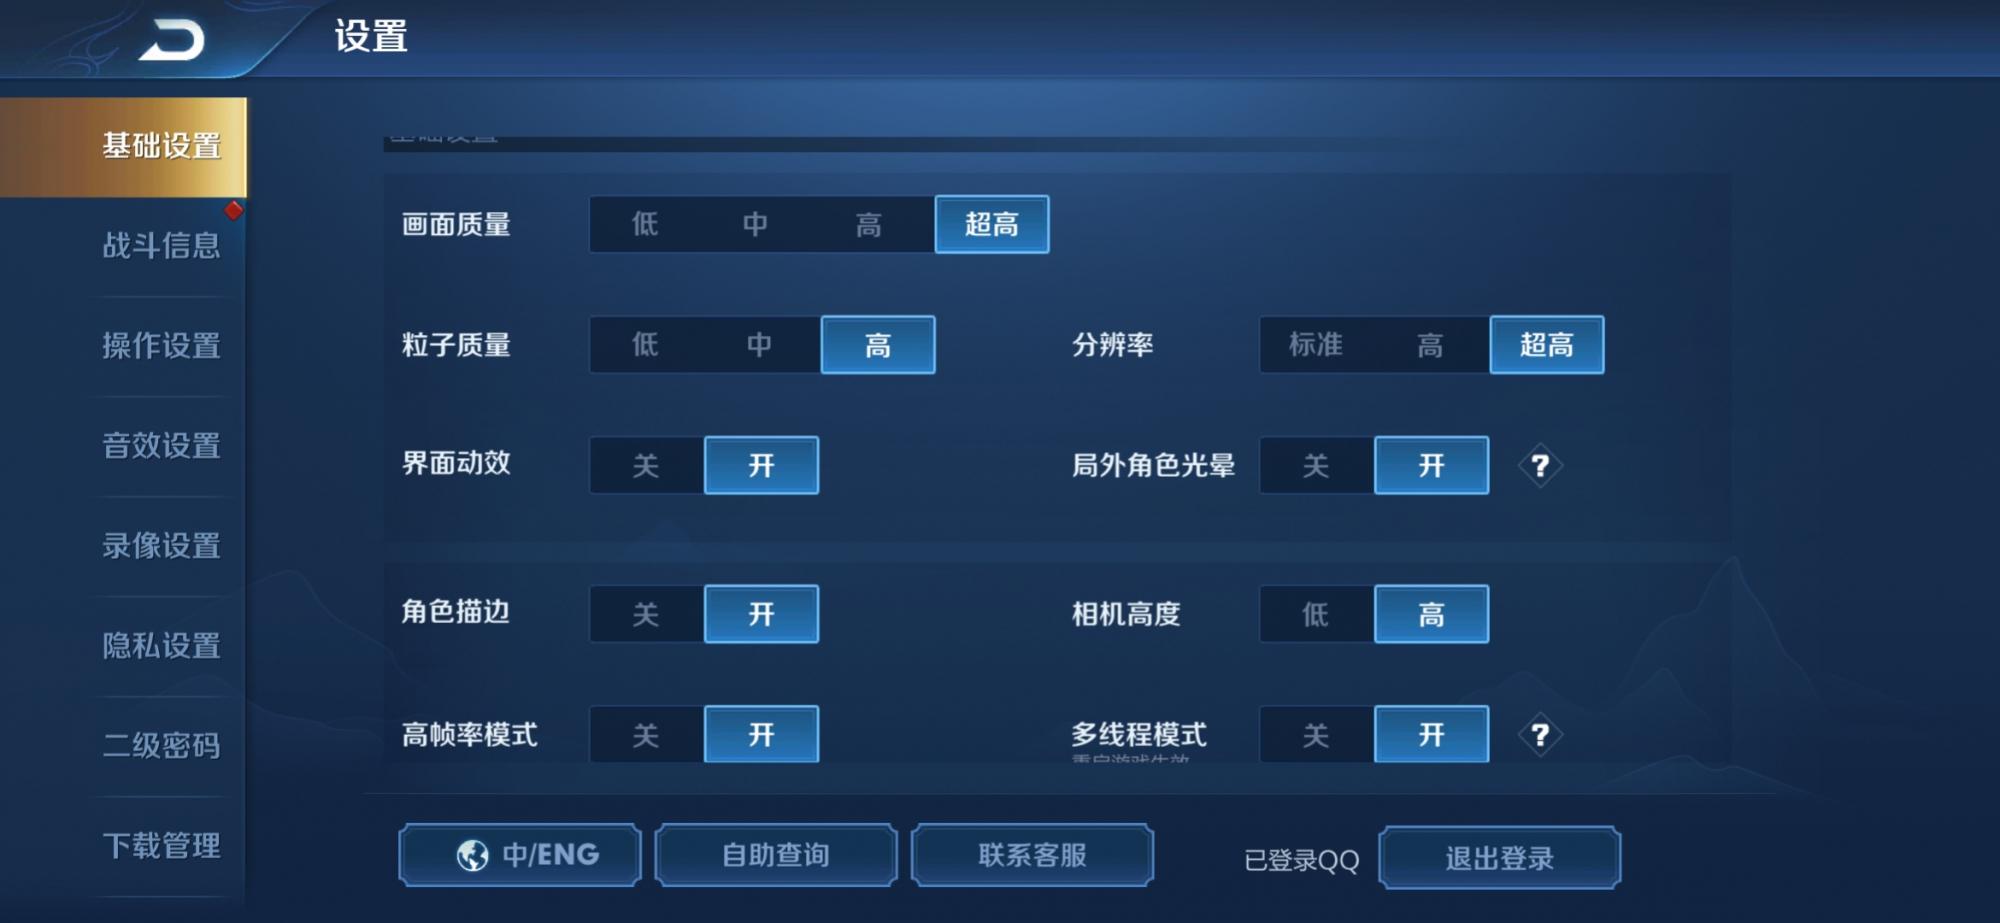 Screenshot_20200109_092441_com.tencent.tmgp.sgame.jpg